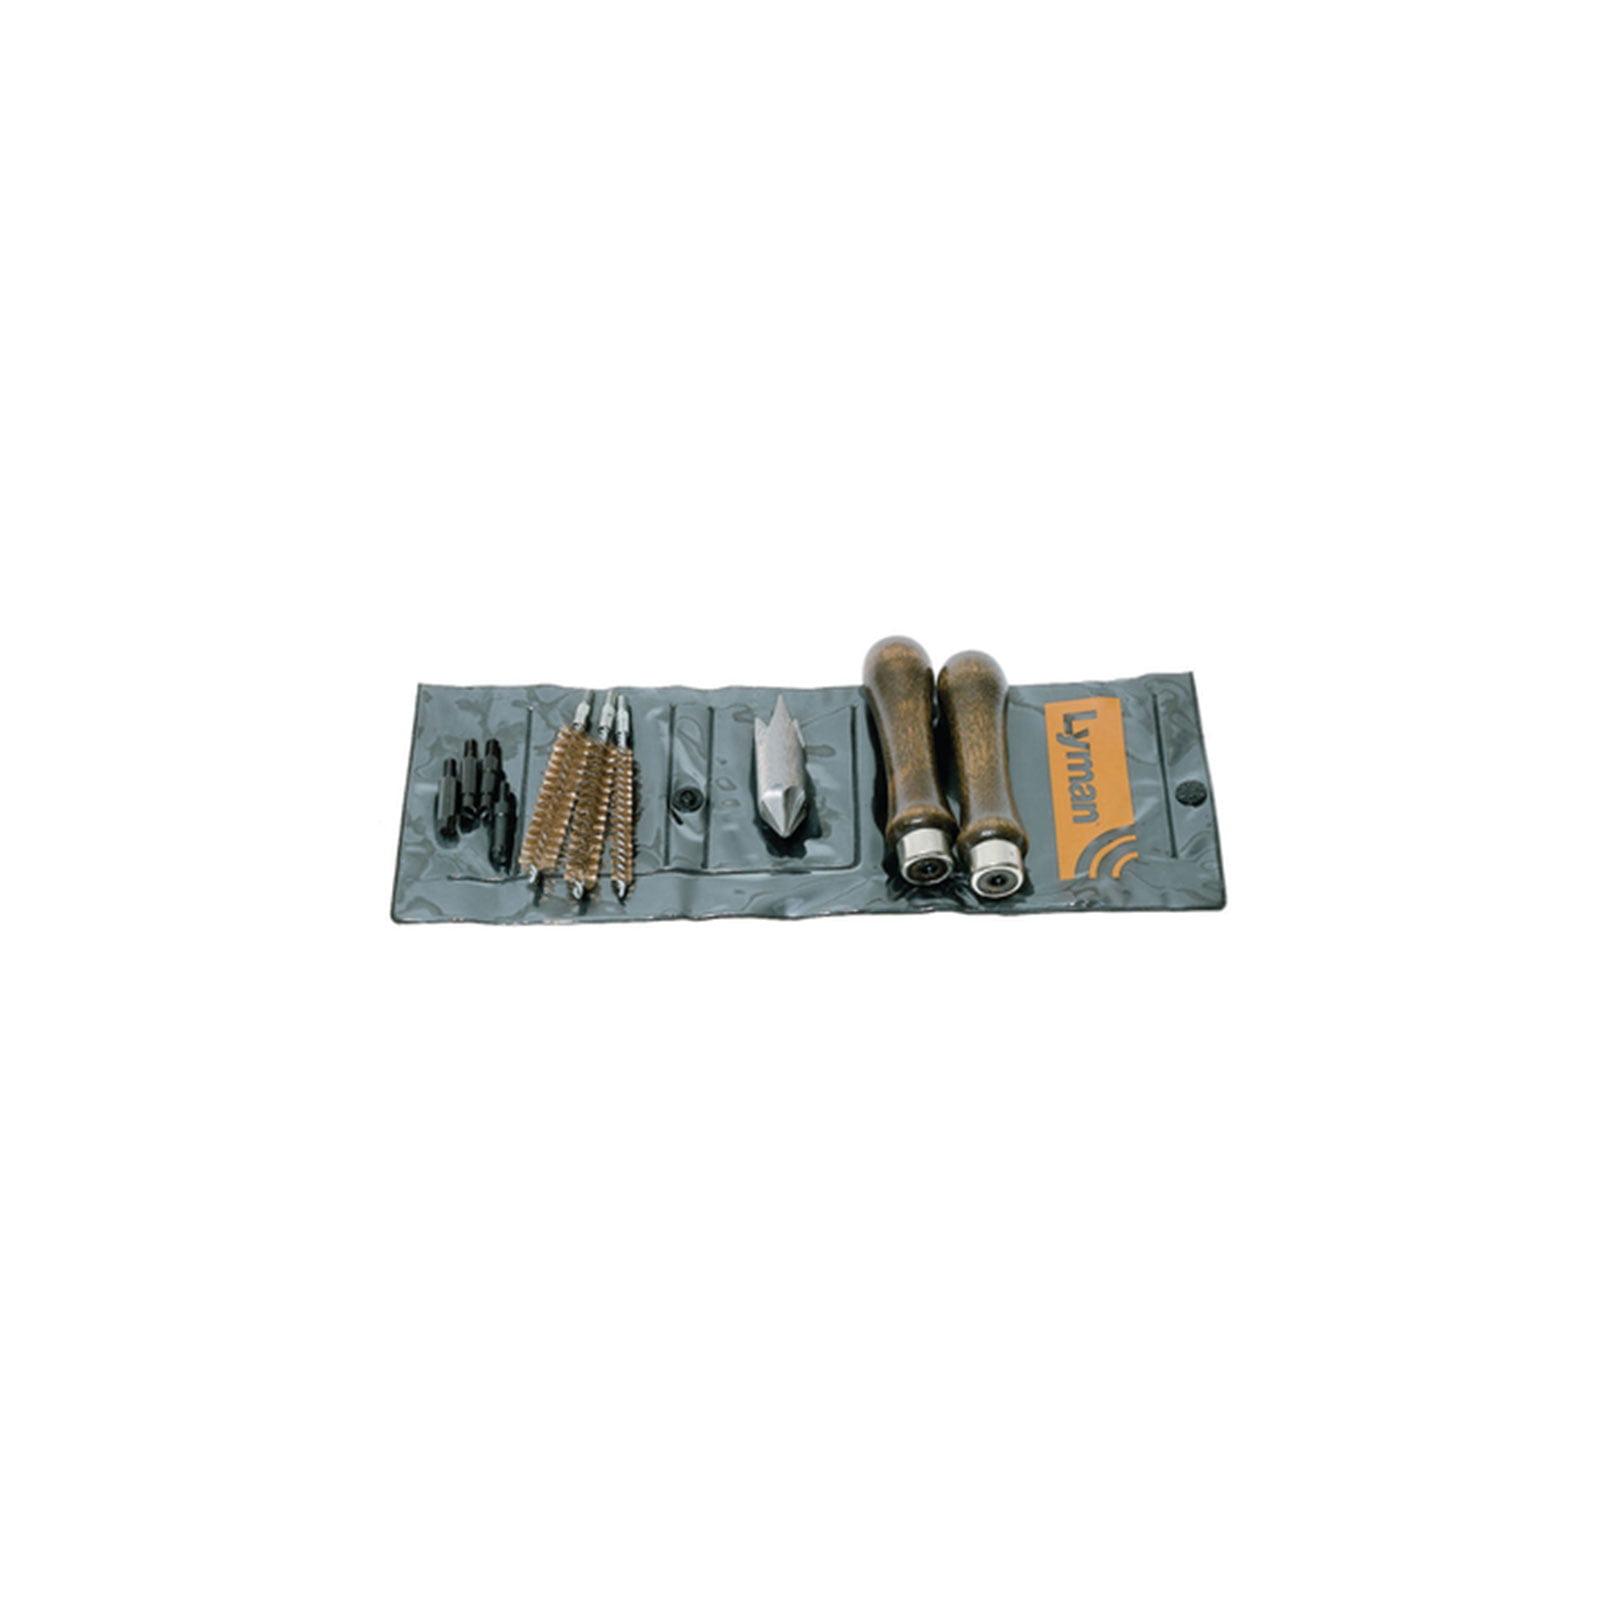 Lyman Case Preparation Kit, 7777796 by Lyman